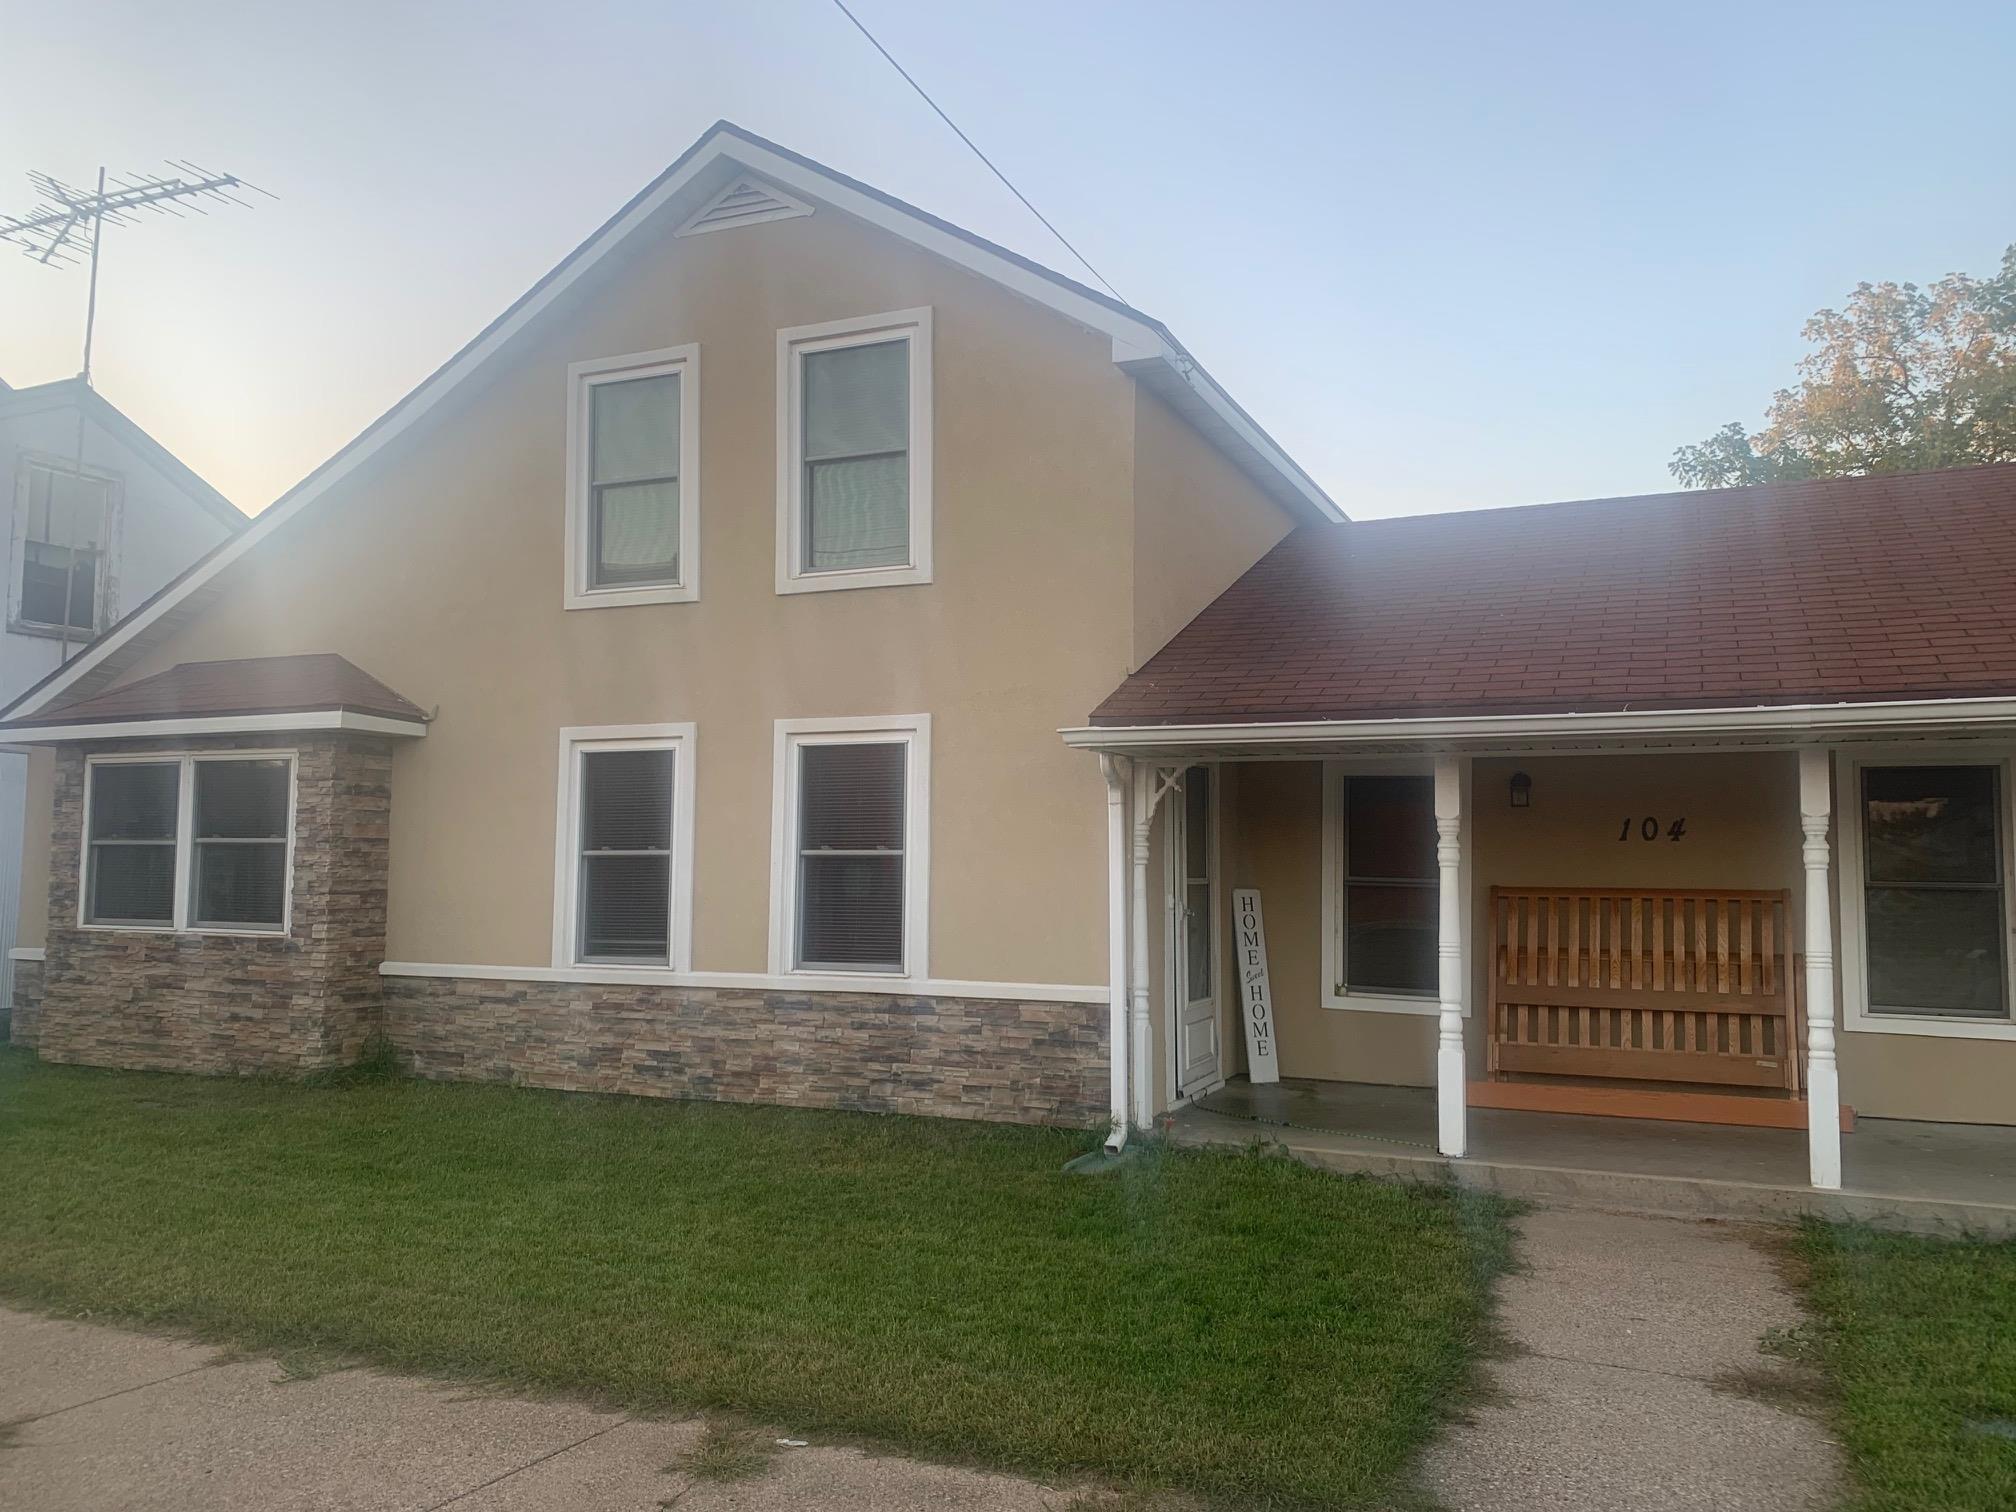 104 E Wisconsin Street, Weyauwega, WI 54983